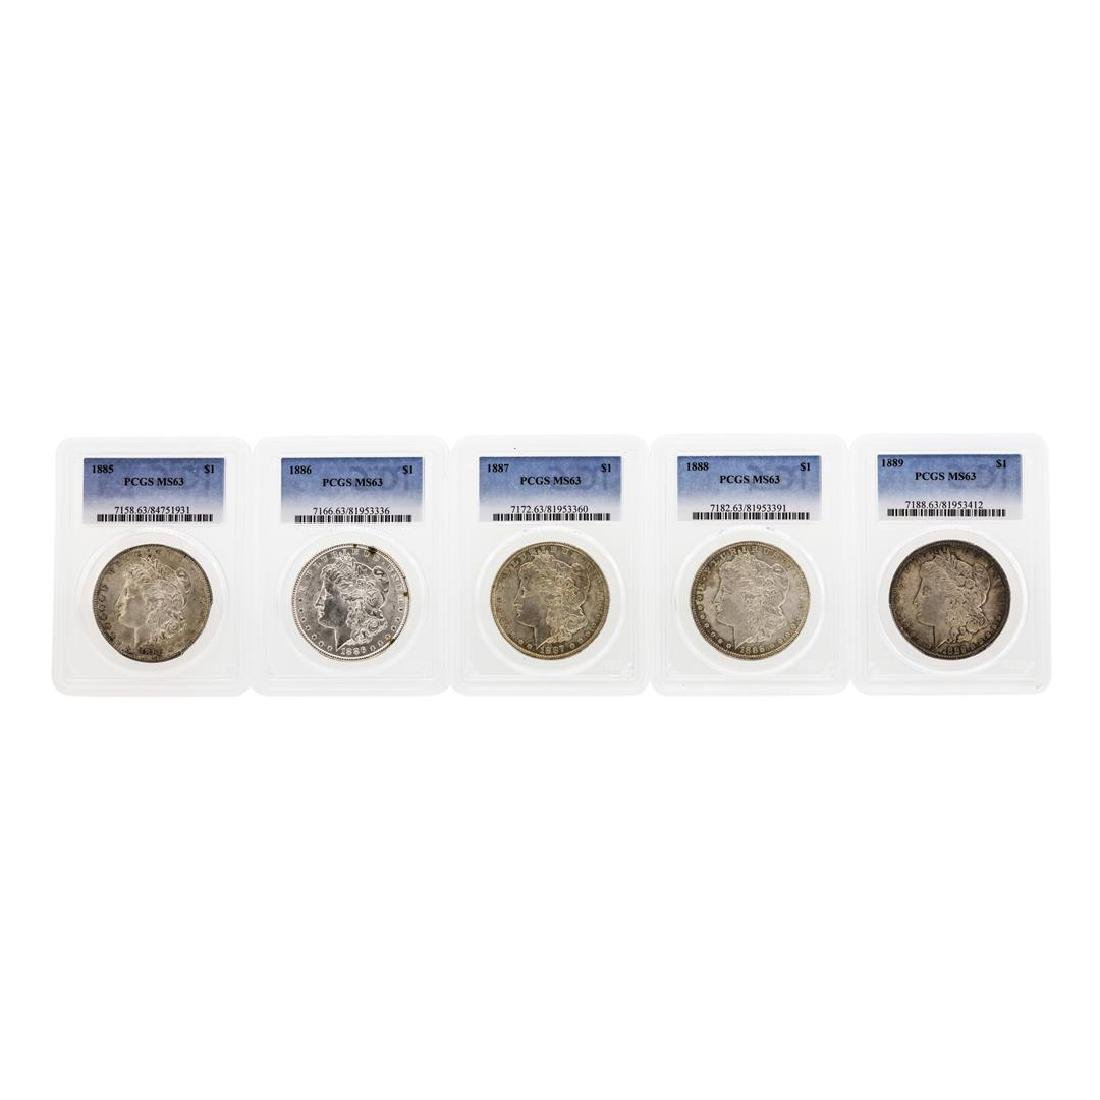 Set of (5) 1885-1889 $1 Morgan Silver Dollar Coins PCGS